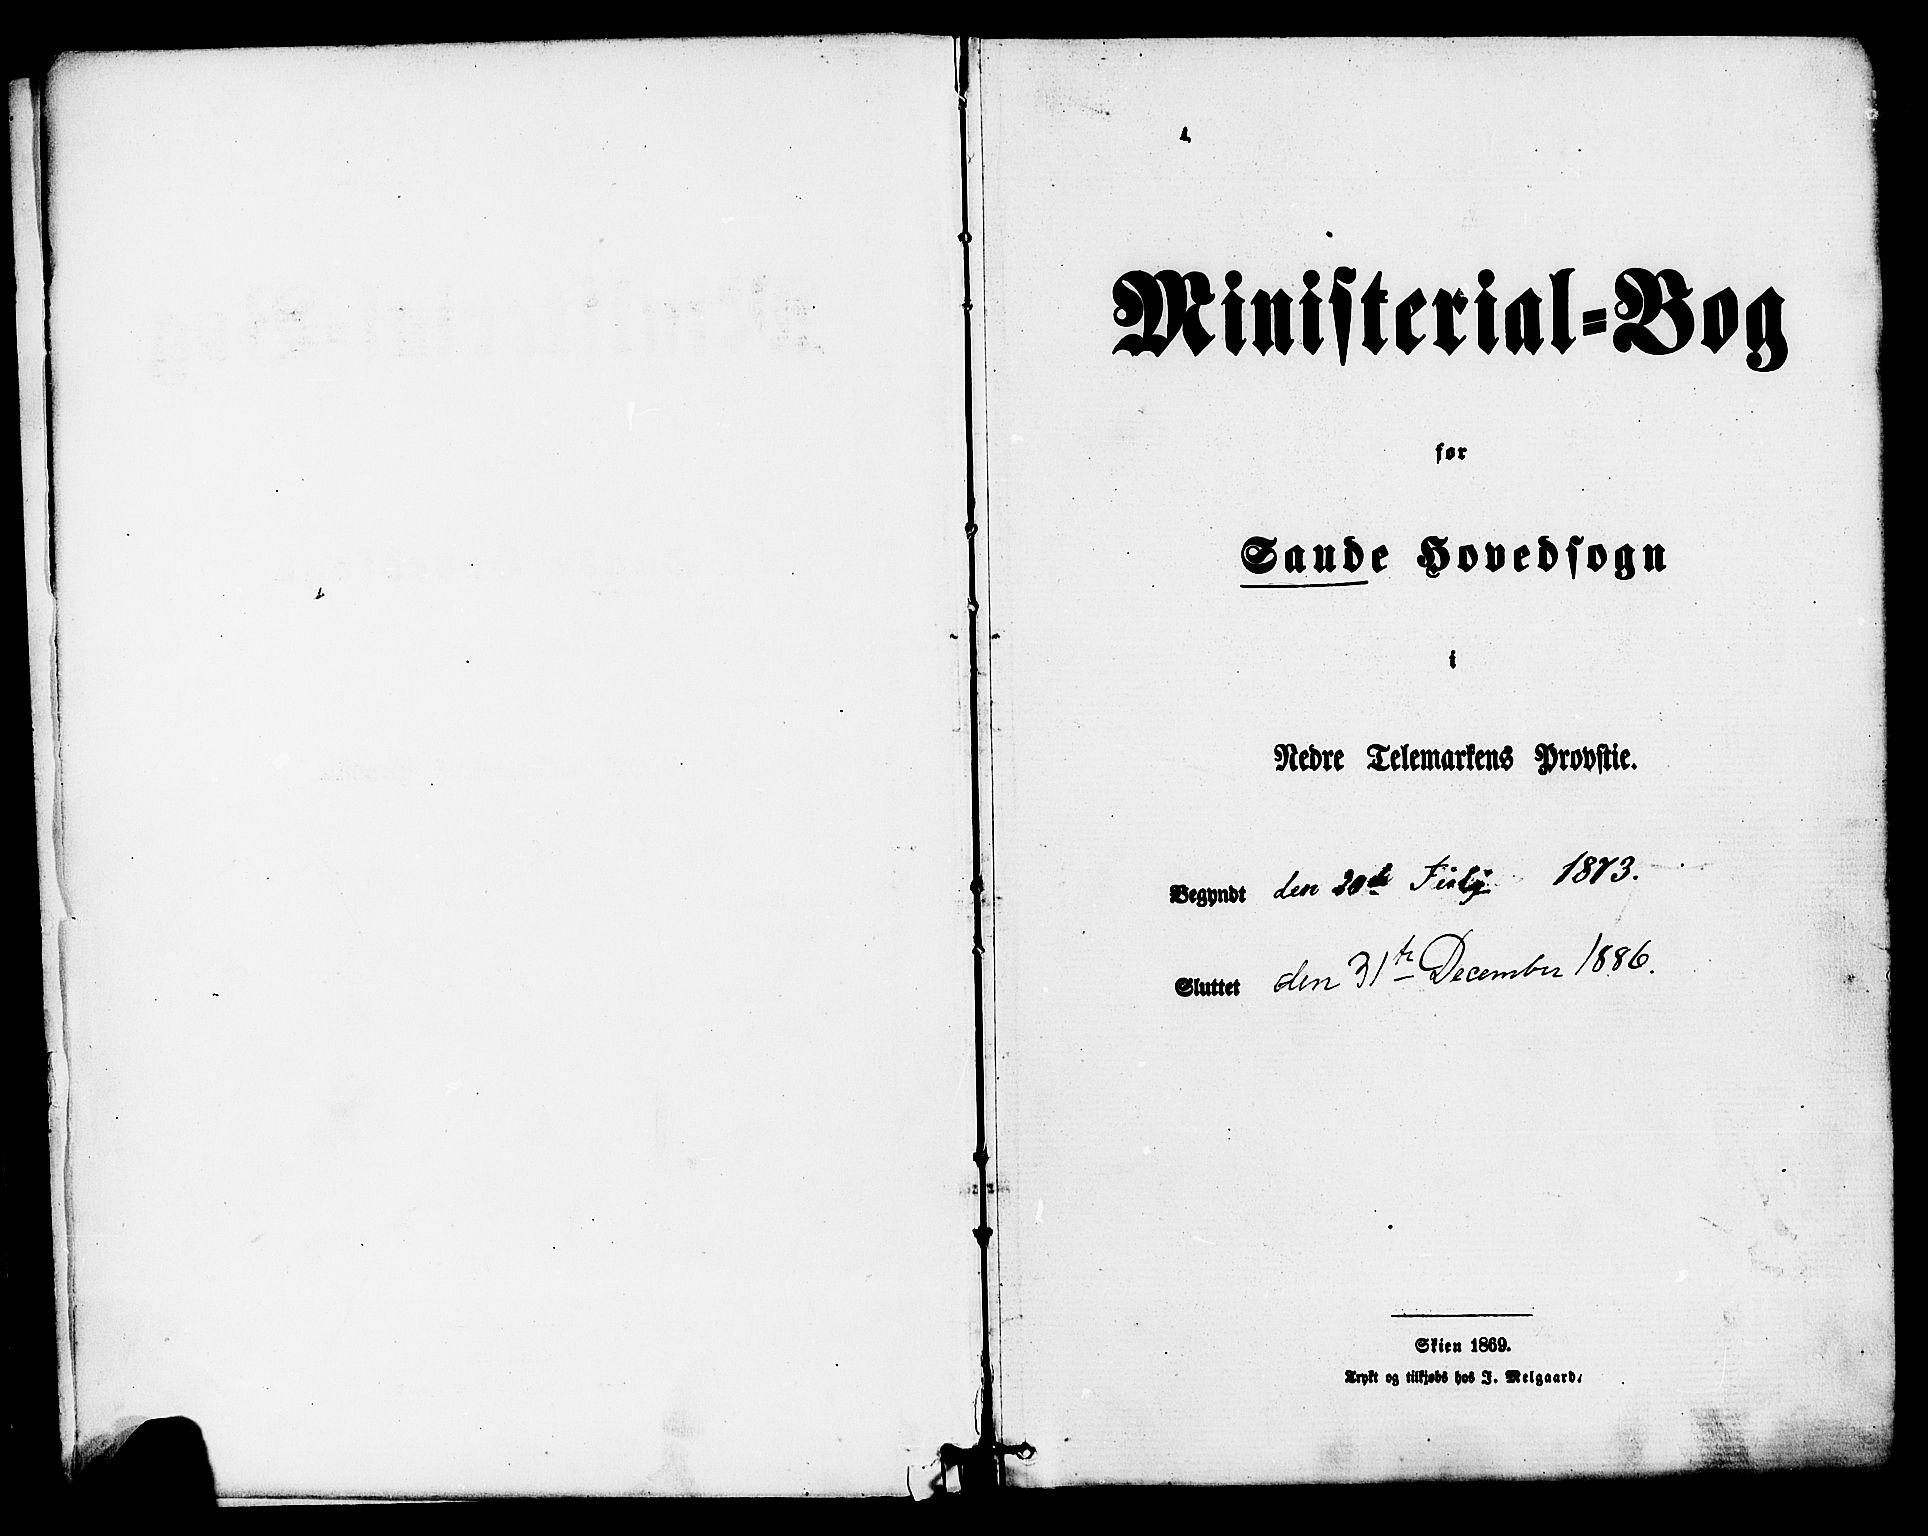 SAKO, Sauherad kirkebøker, F/Fa/L0008: Ministerialbok nr. I 8, 1873-1886